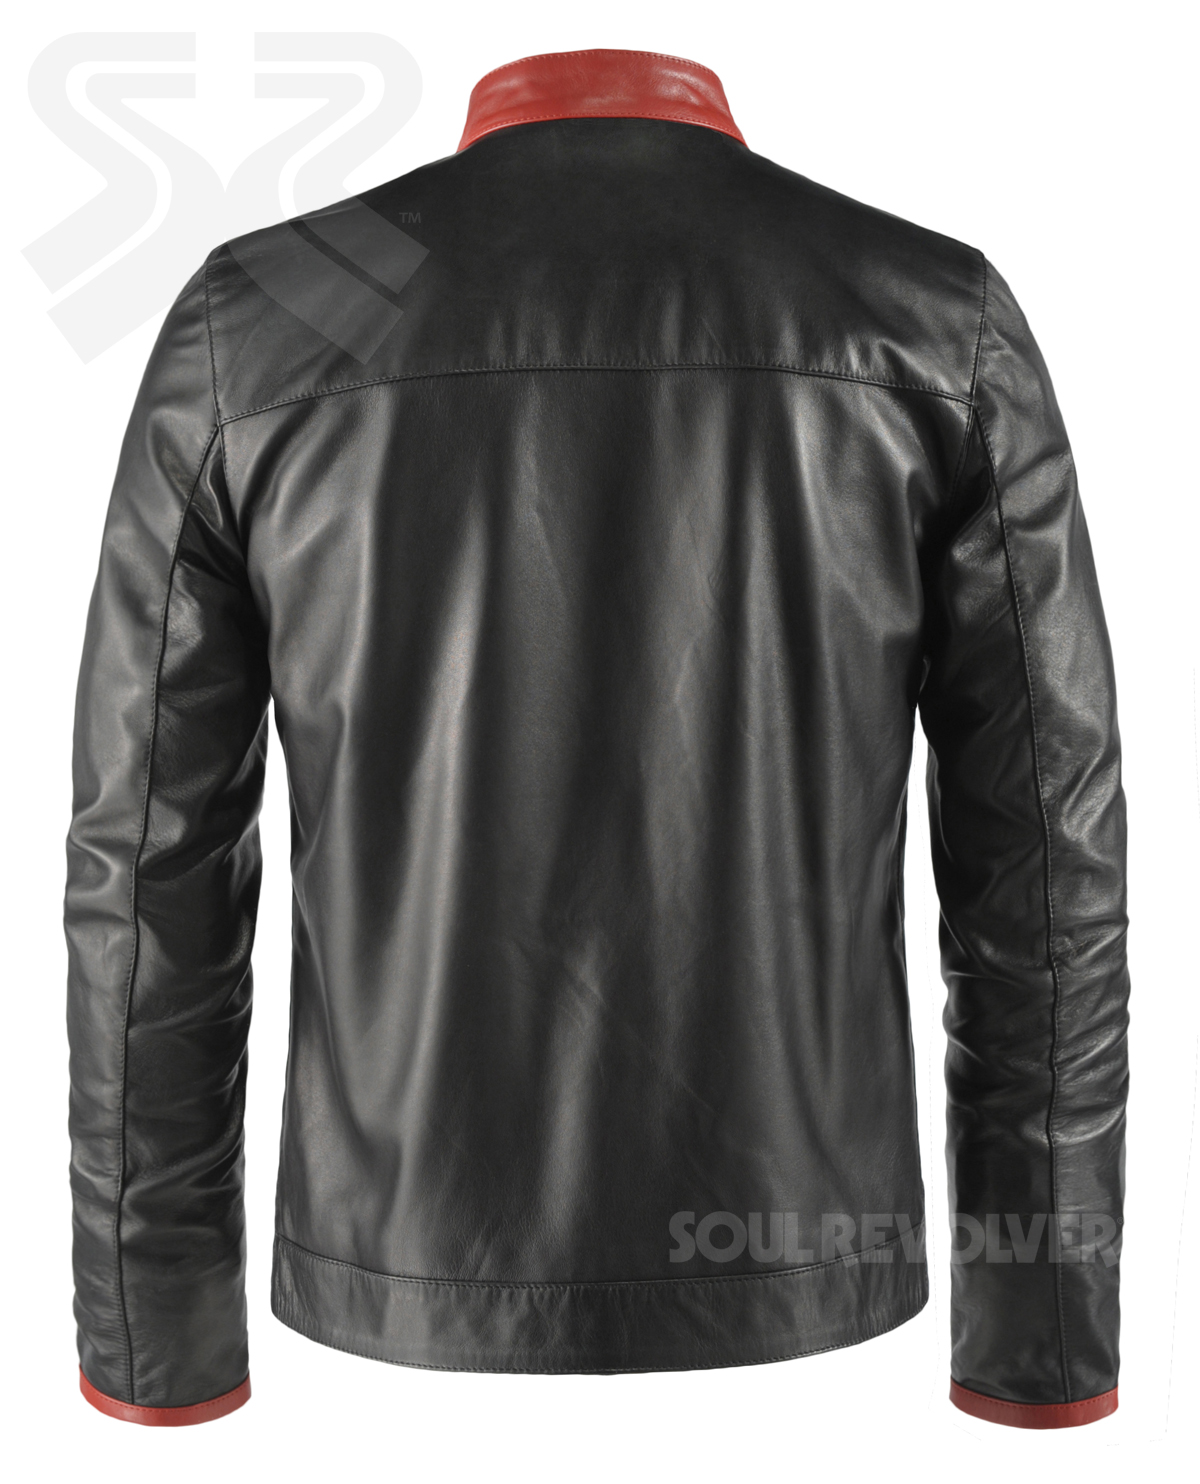 Dark knight leather jacket